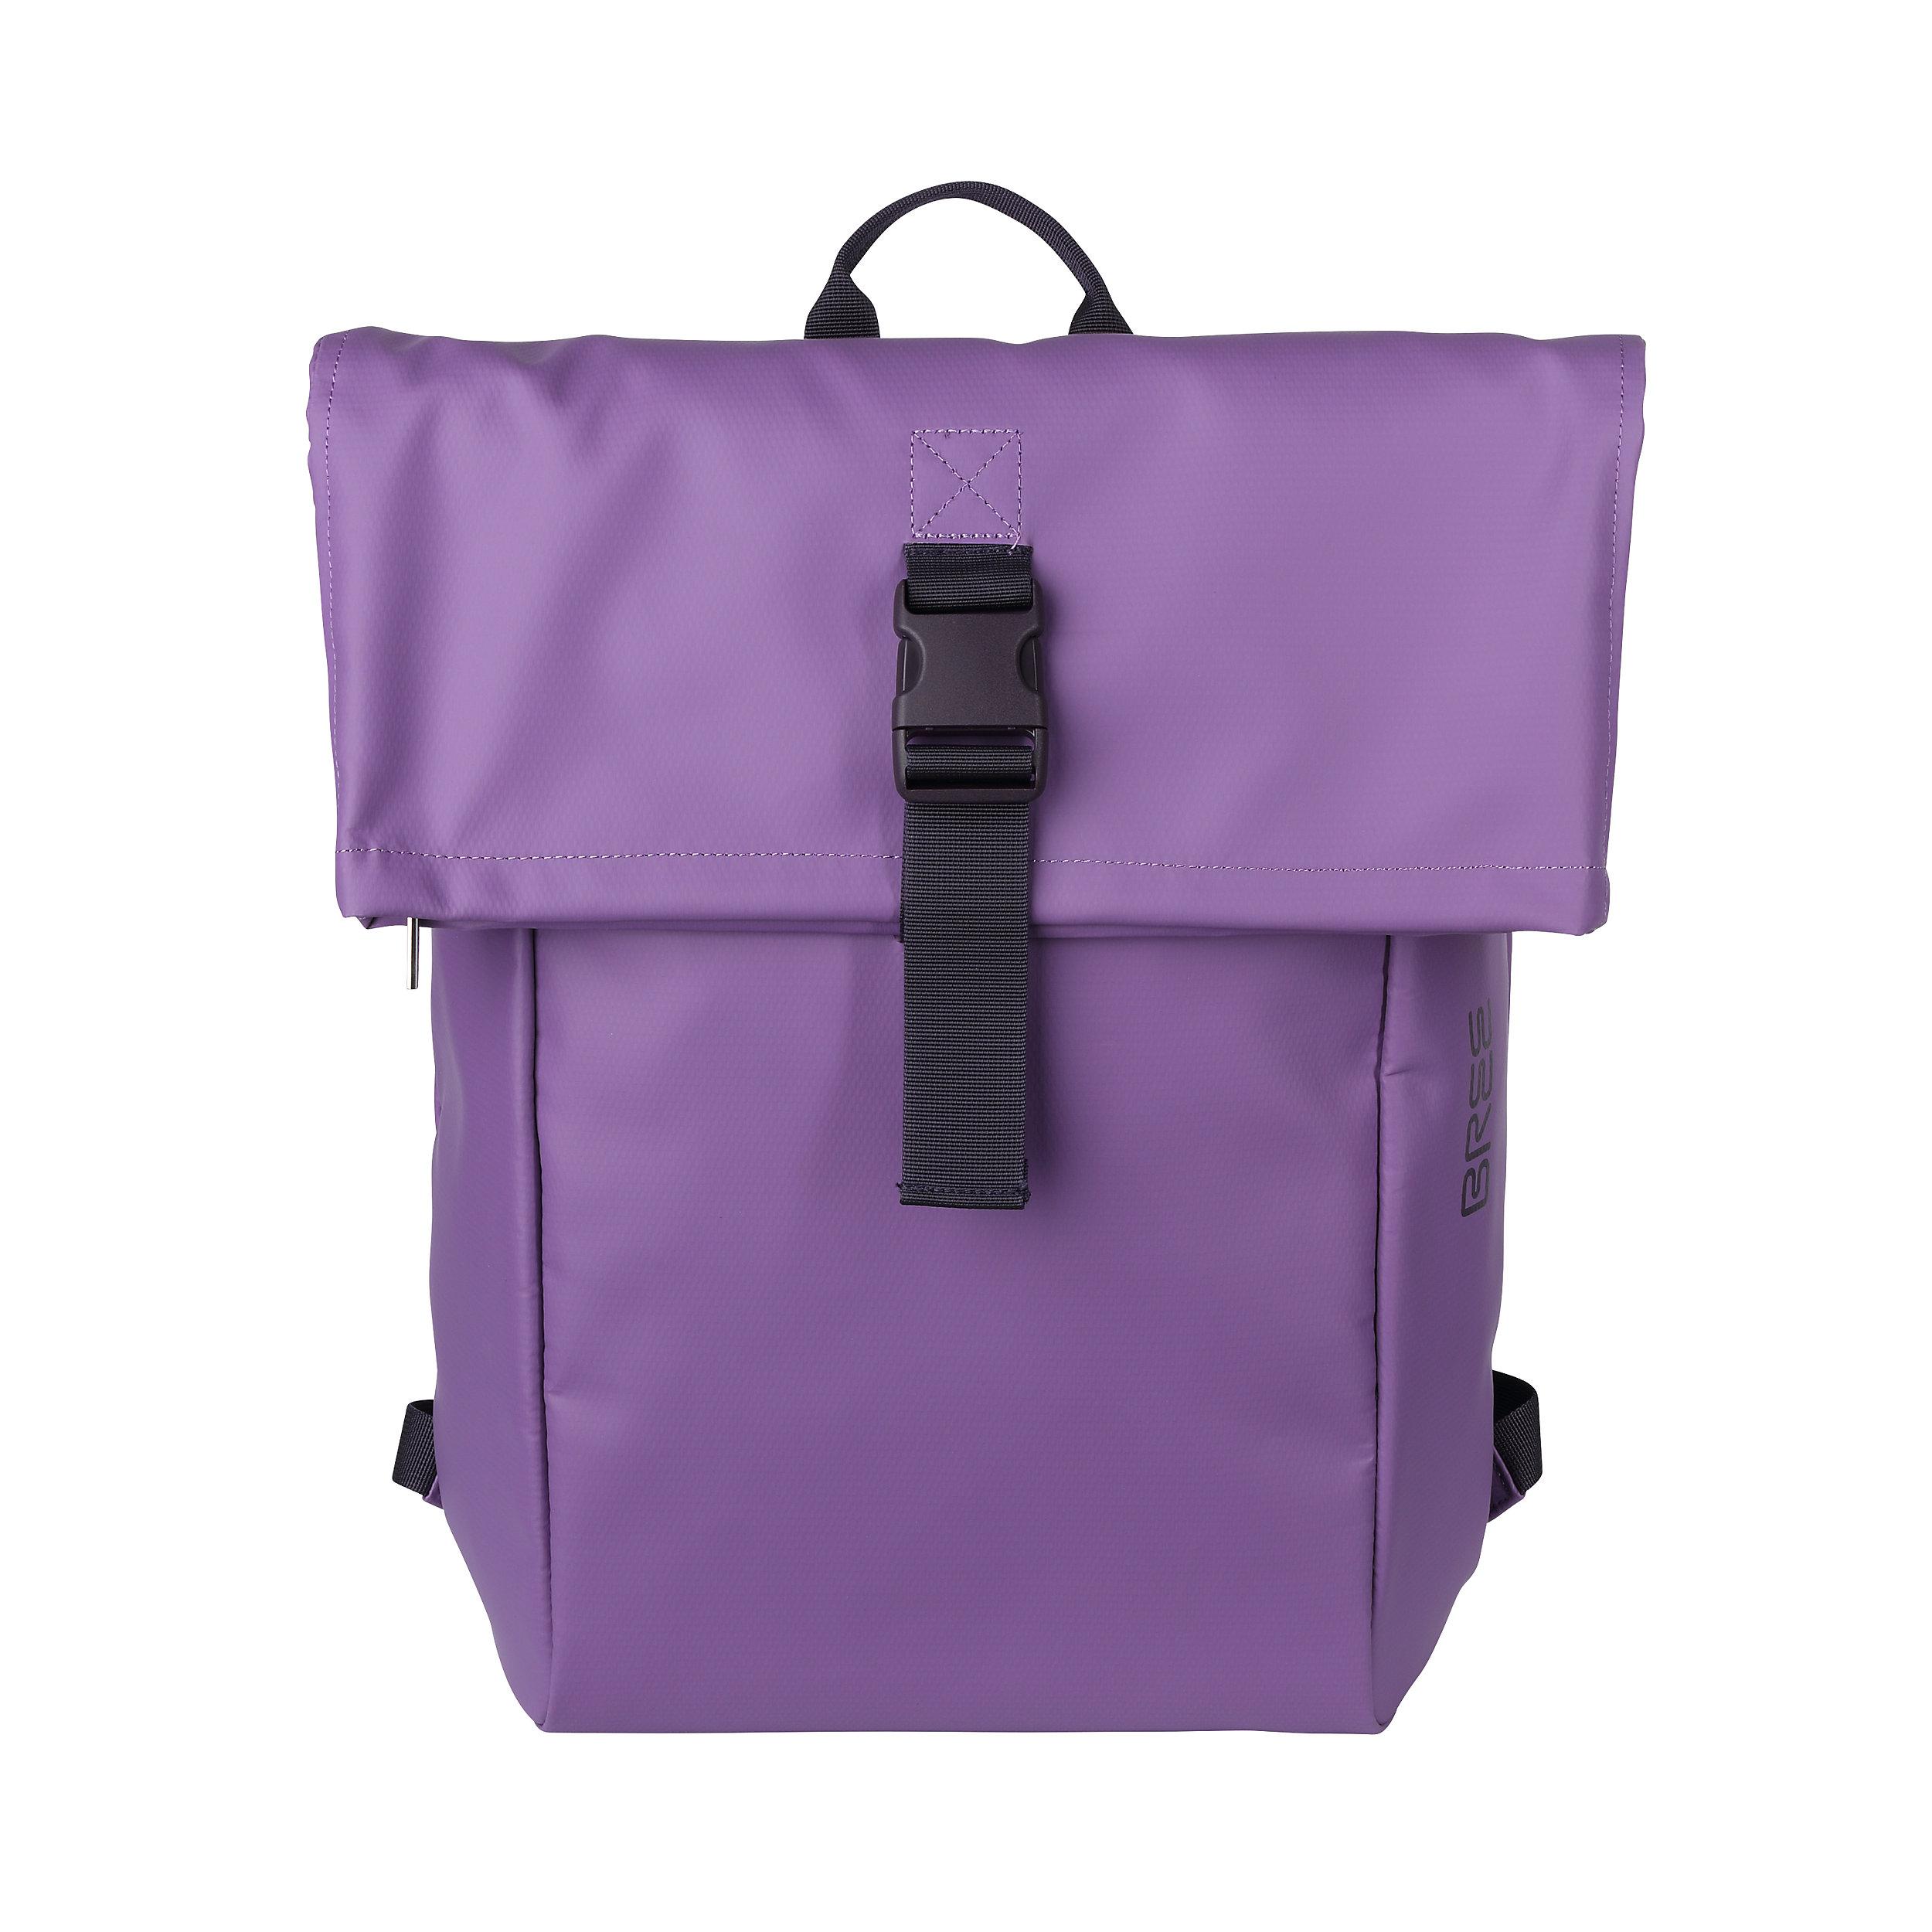 Backpack Punch 93 Punch 23 Liter